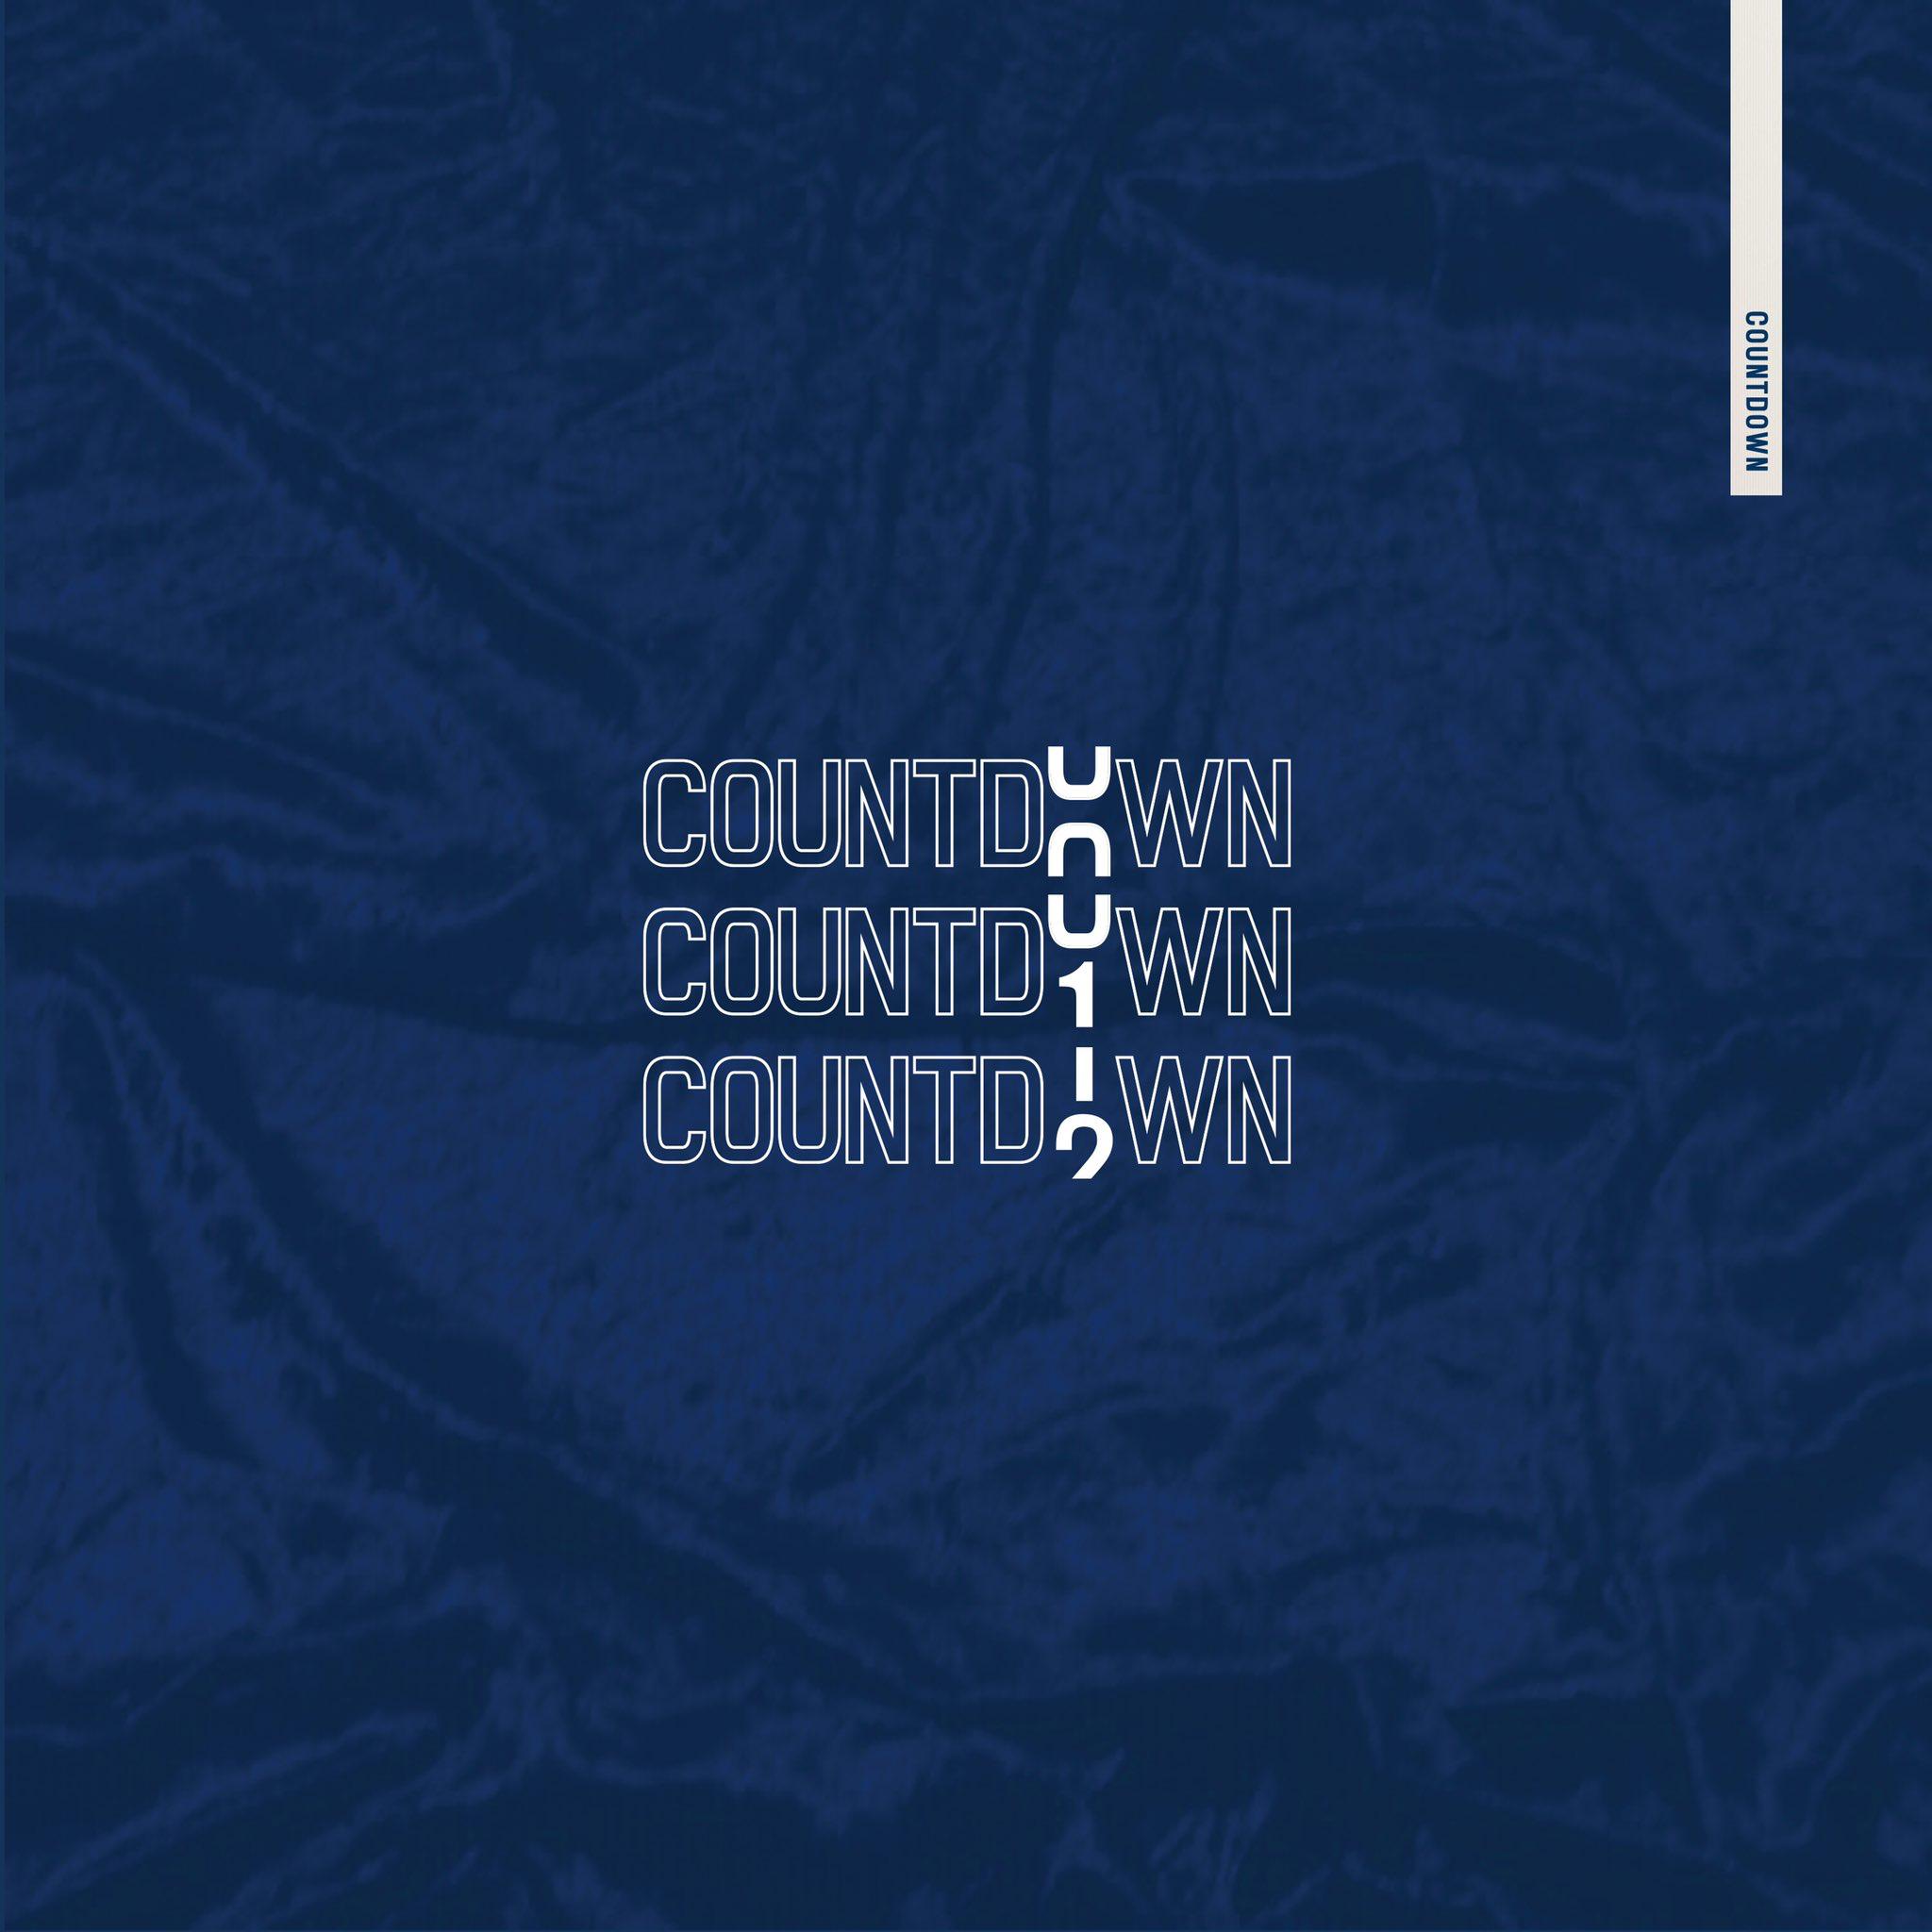 Countdown (TST)